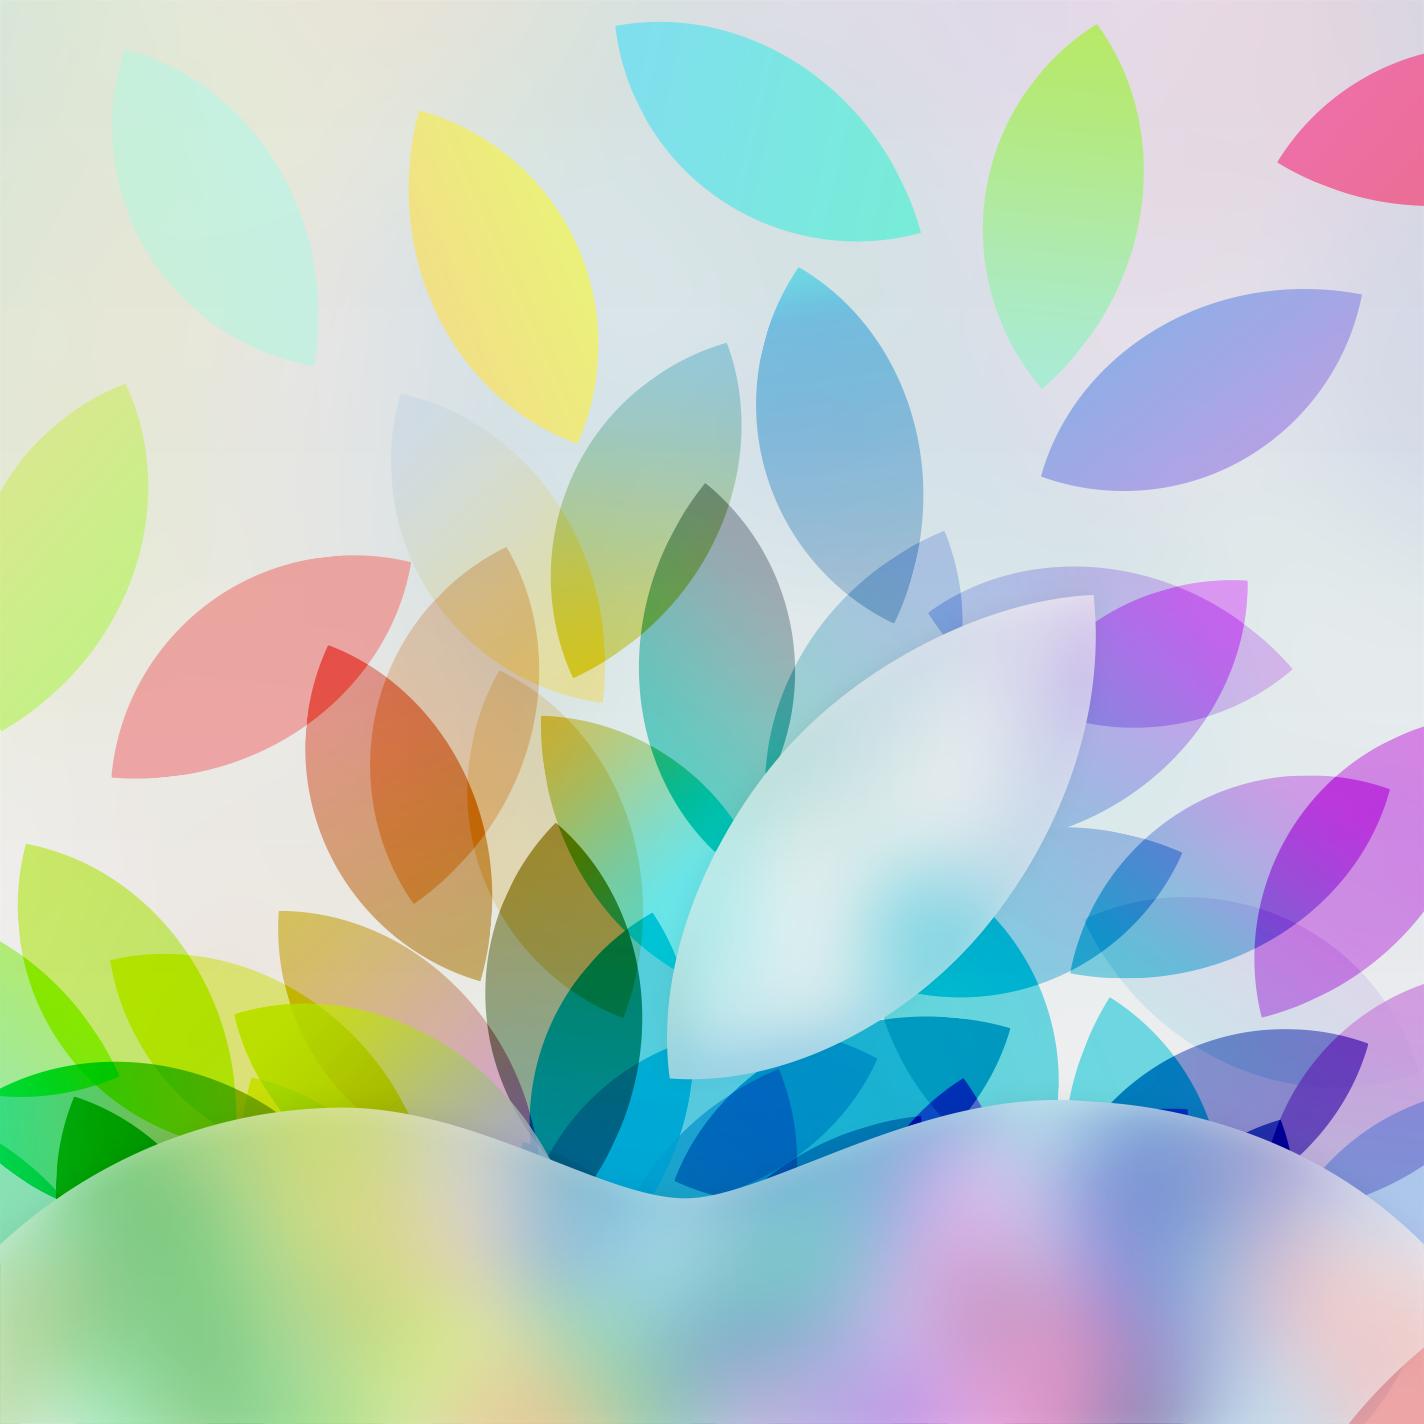 wallpaper for ipad mini   Wallpapers 1424x1424